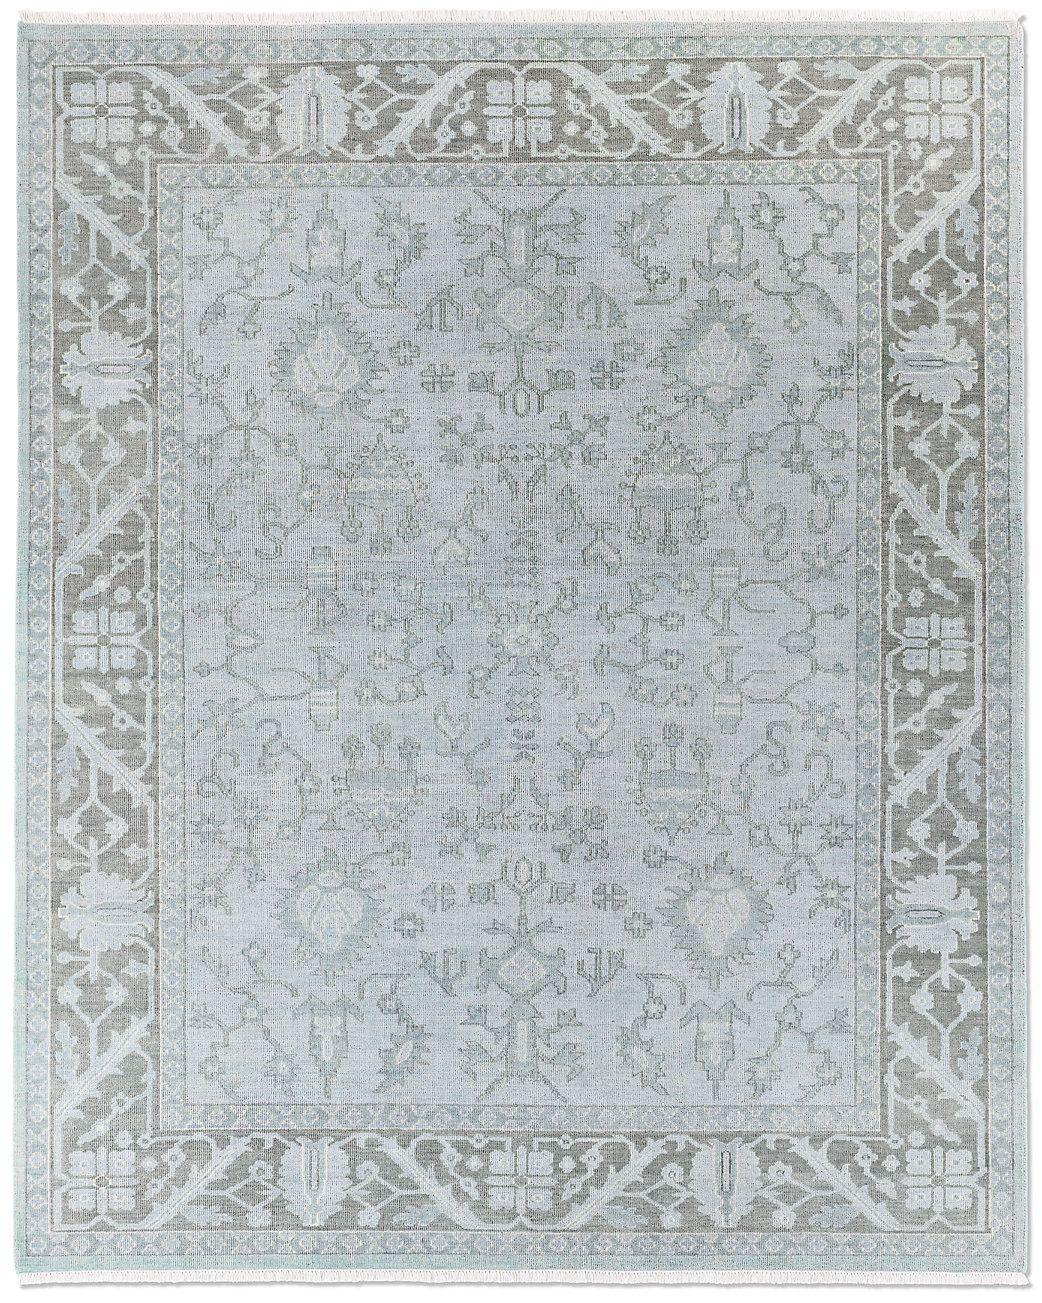 Ashra Rug Rugs Rugs On Carpet Classic Carpets